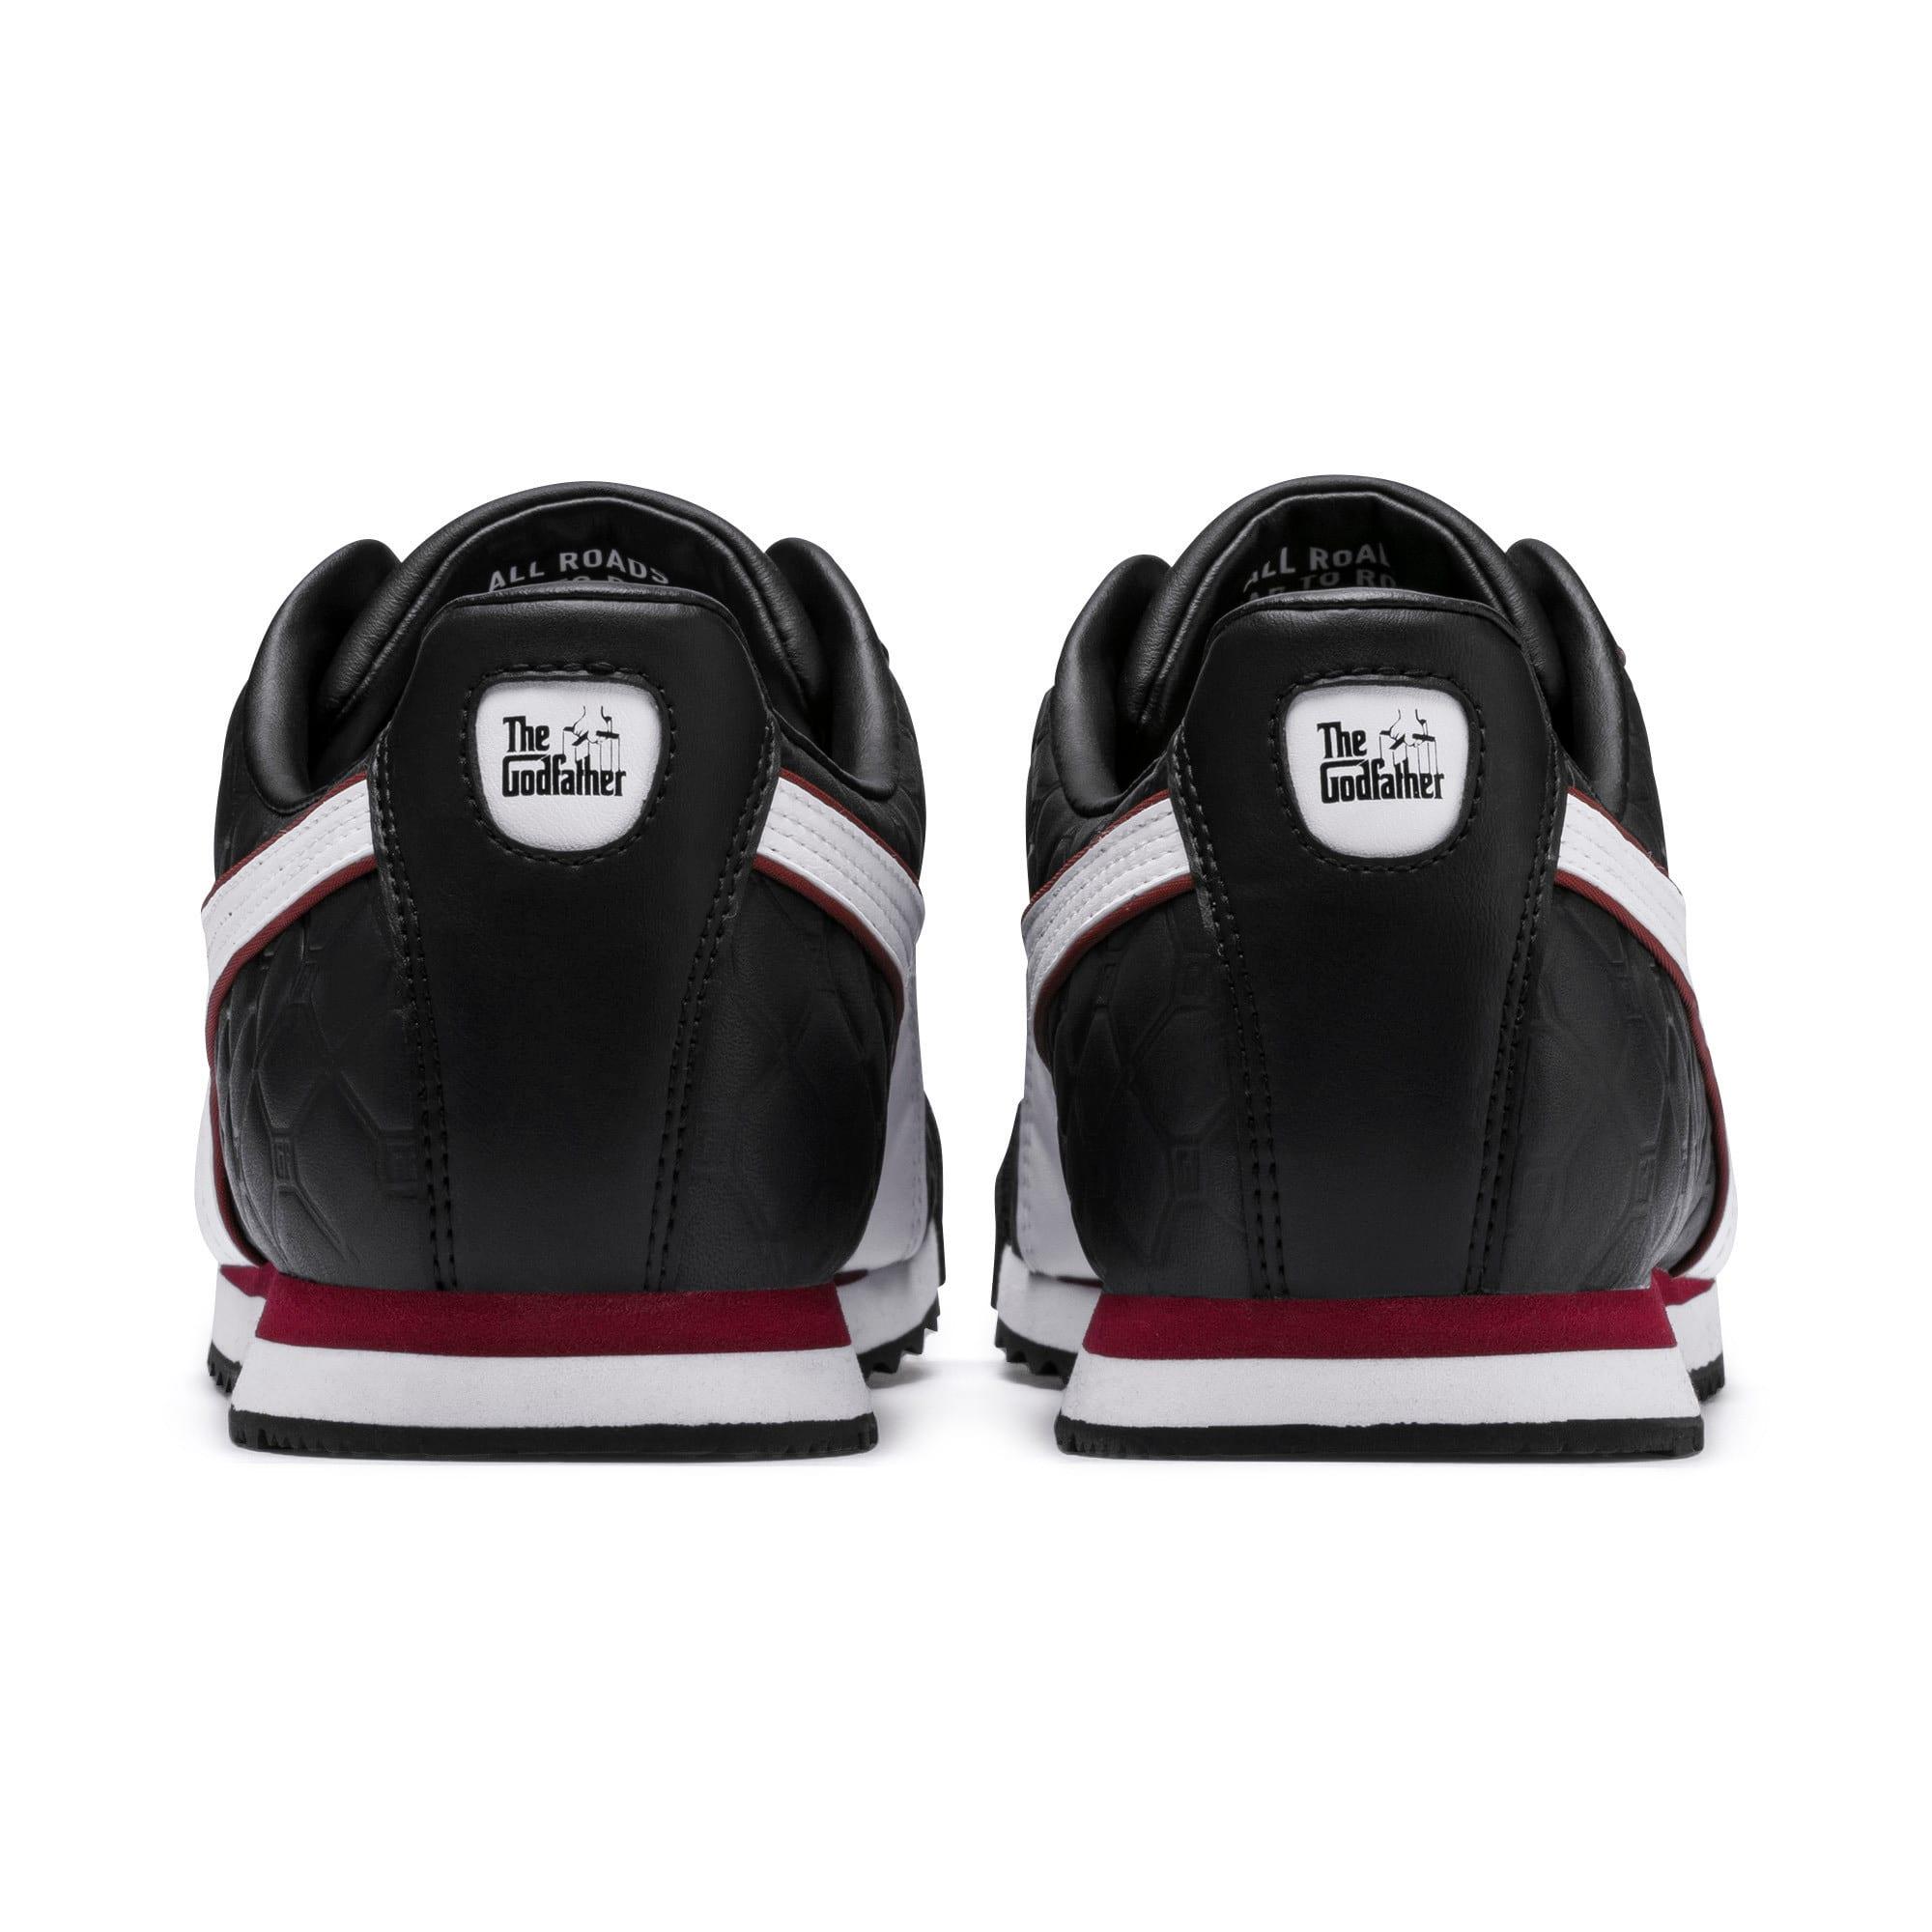 Miniatura 3 de Zapatos deportivos PUMA x THE GODFATHER Roma Louis, Puma Black-Fired Brick, mediano